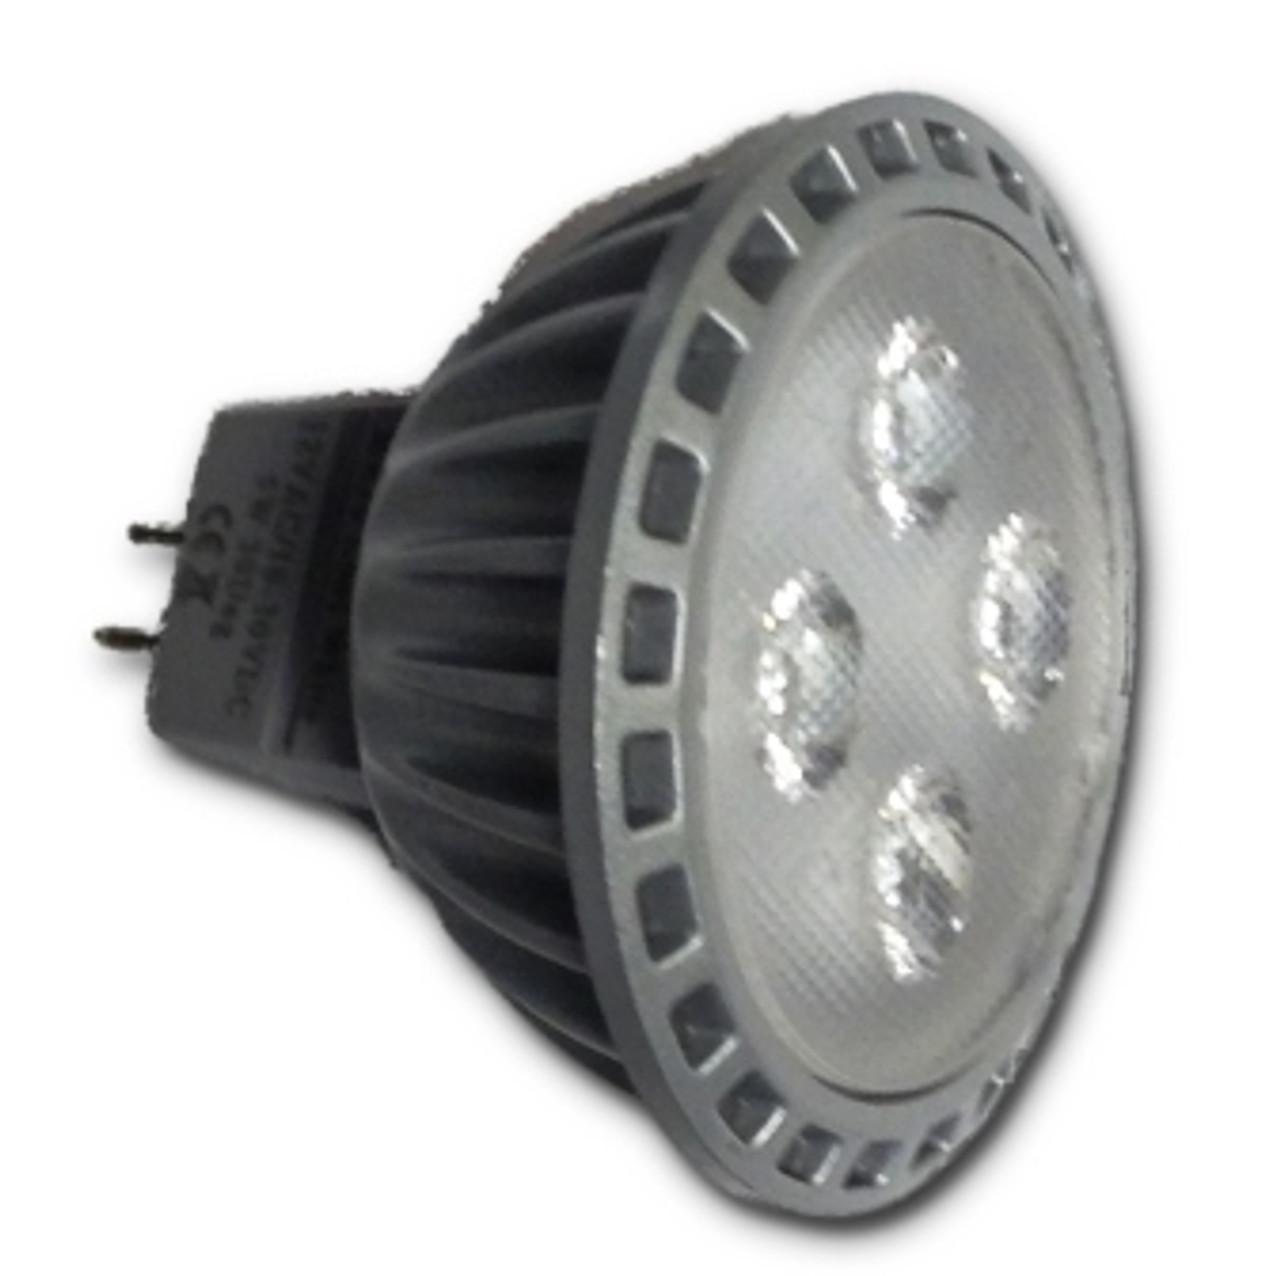 5W MR16 Deck Light Bulb for Hella and Forespar (MR16-5W)